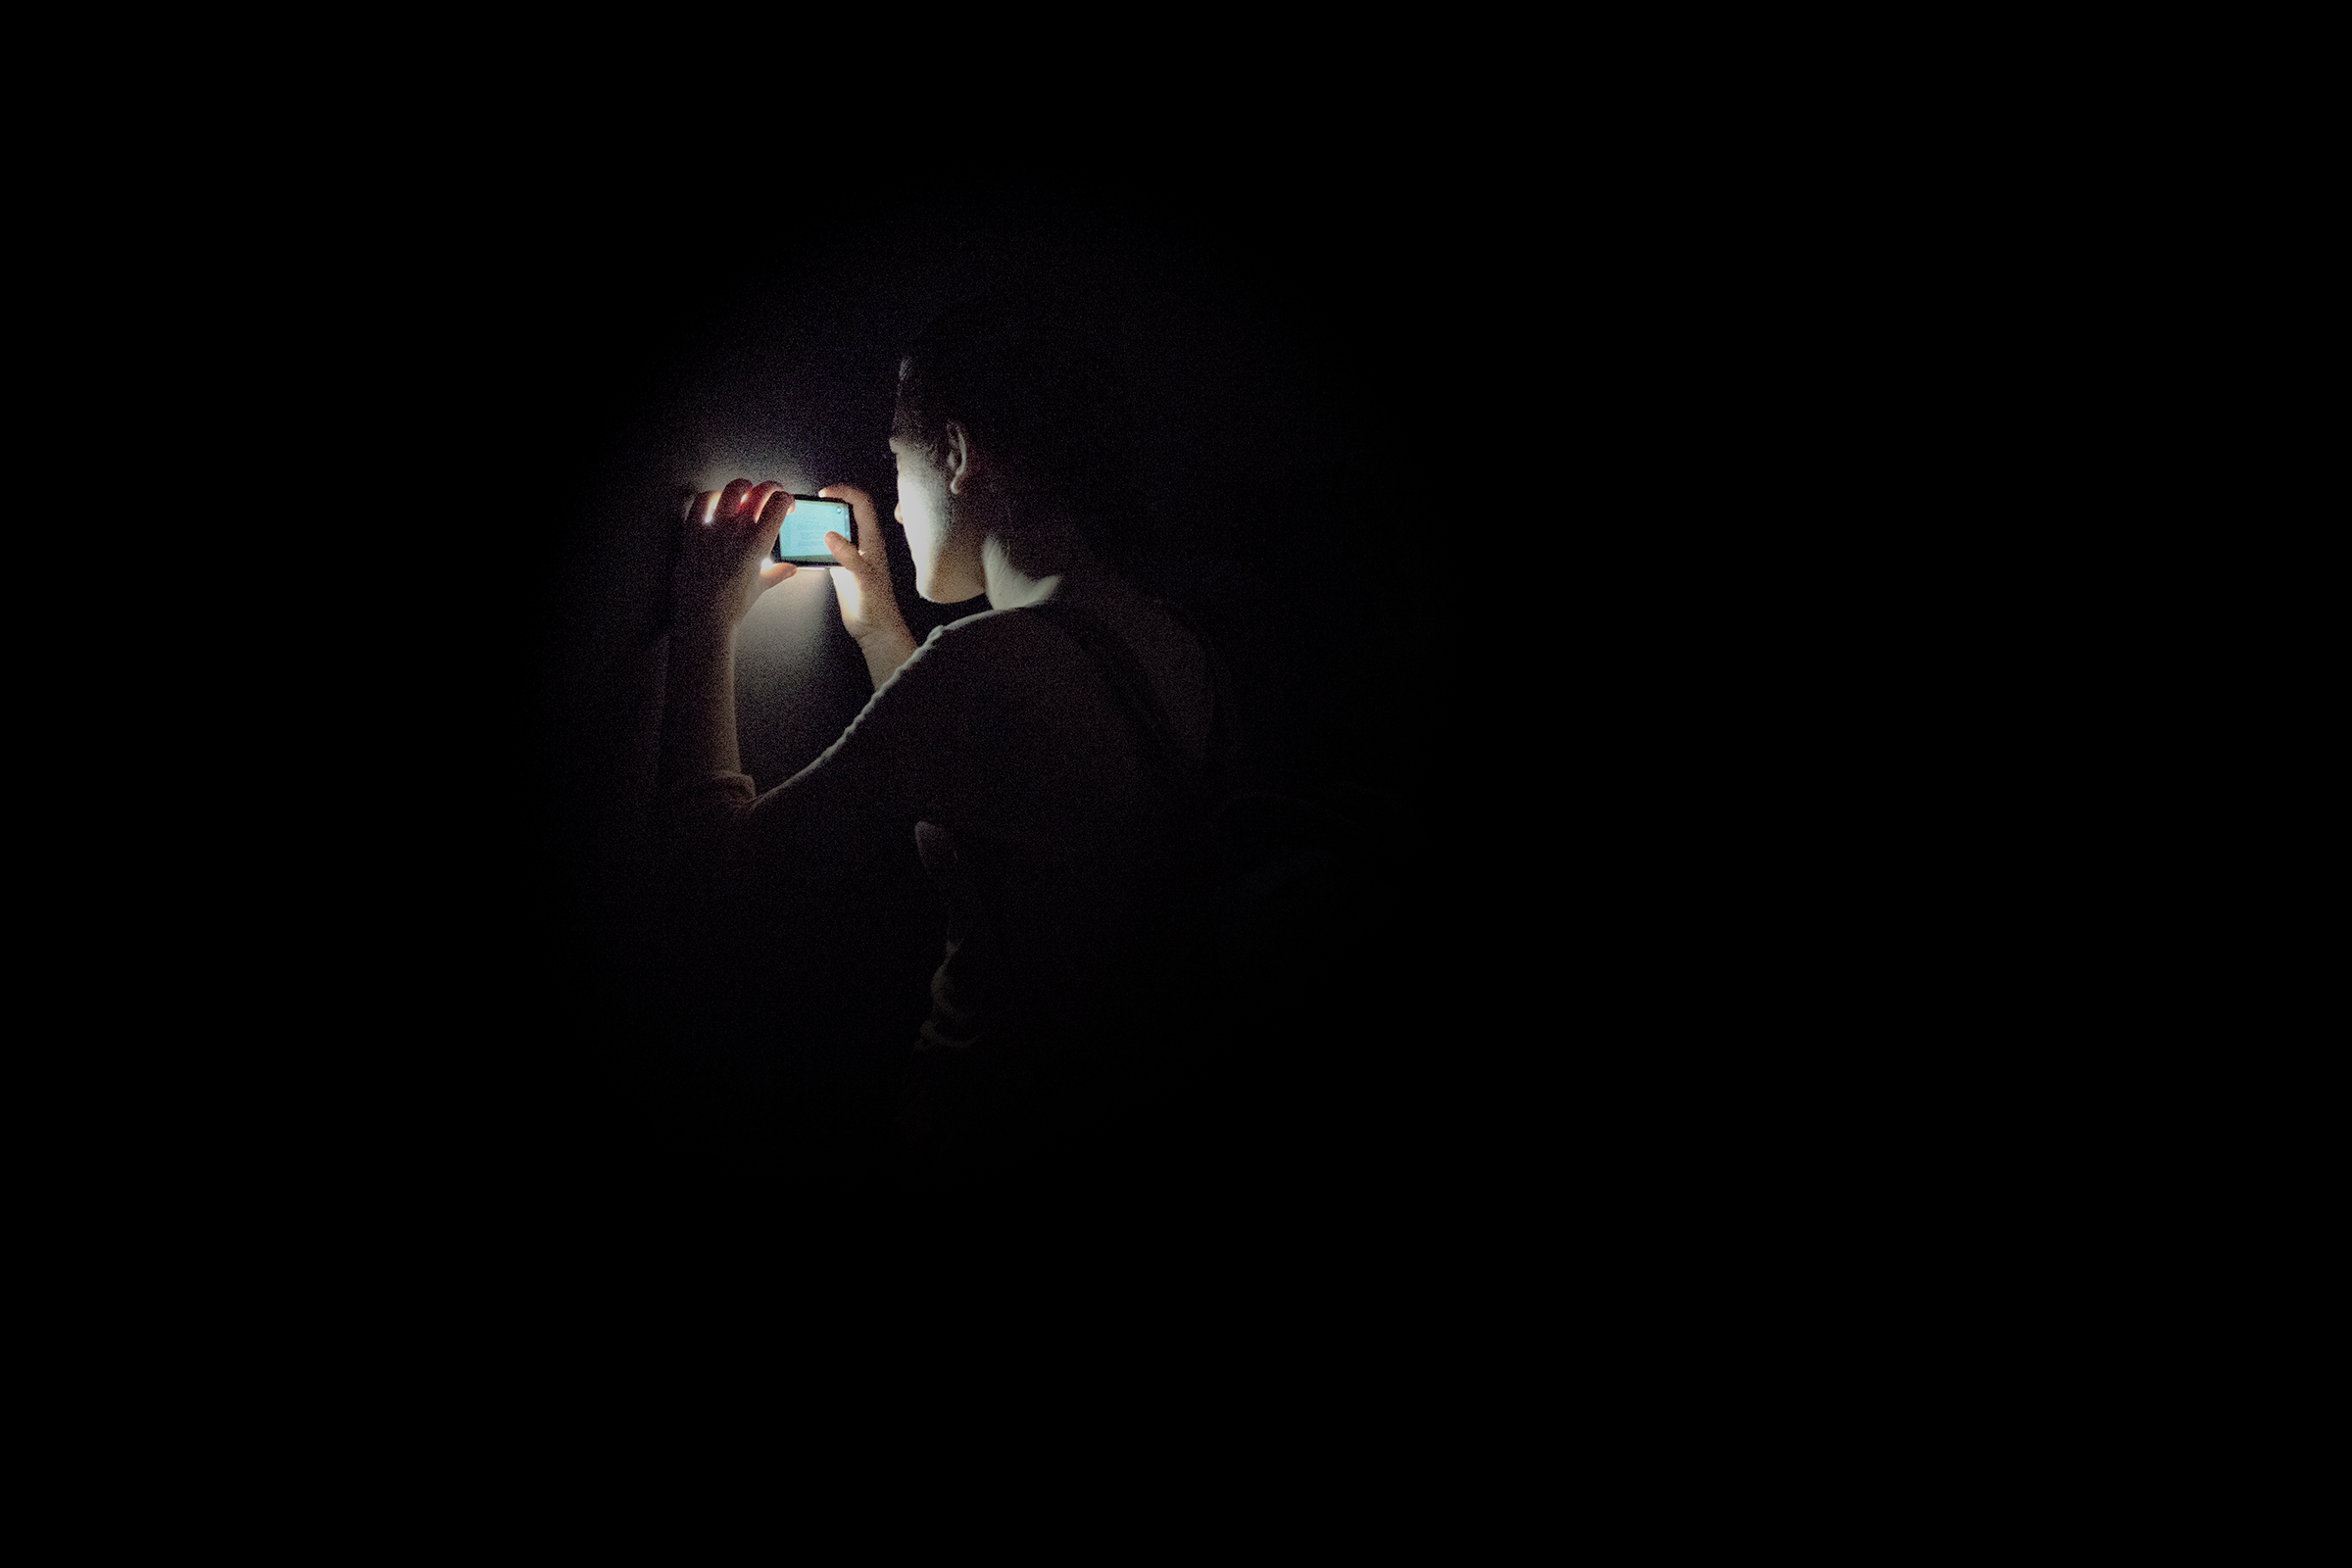 Woman with Phone.jpg